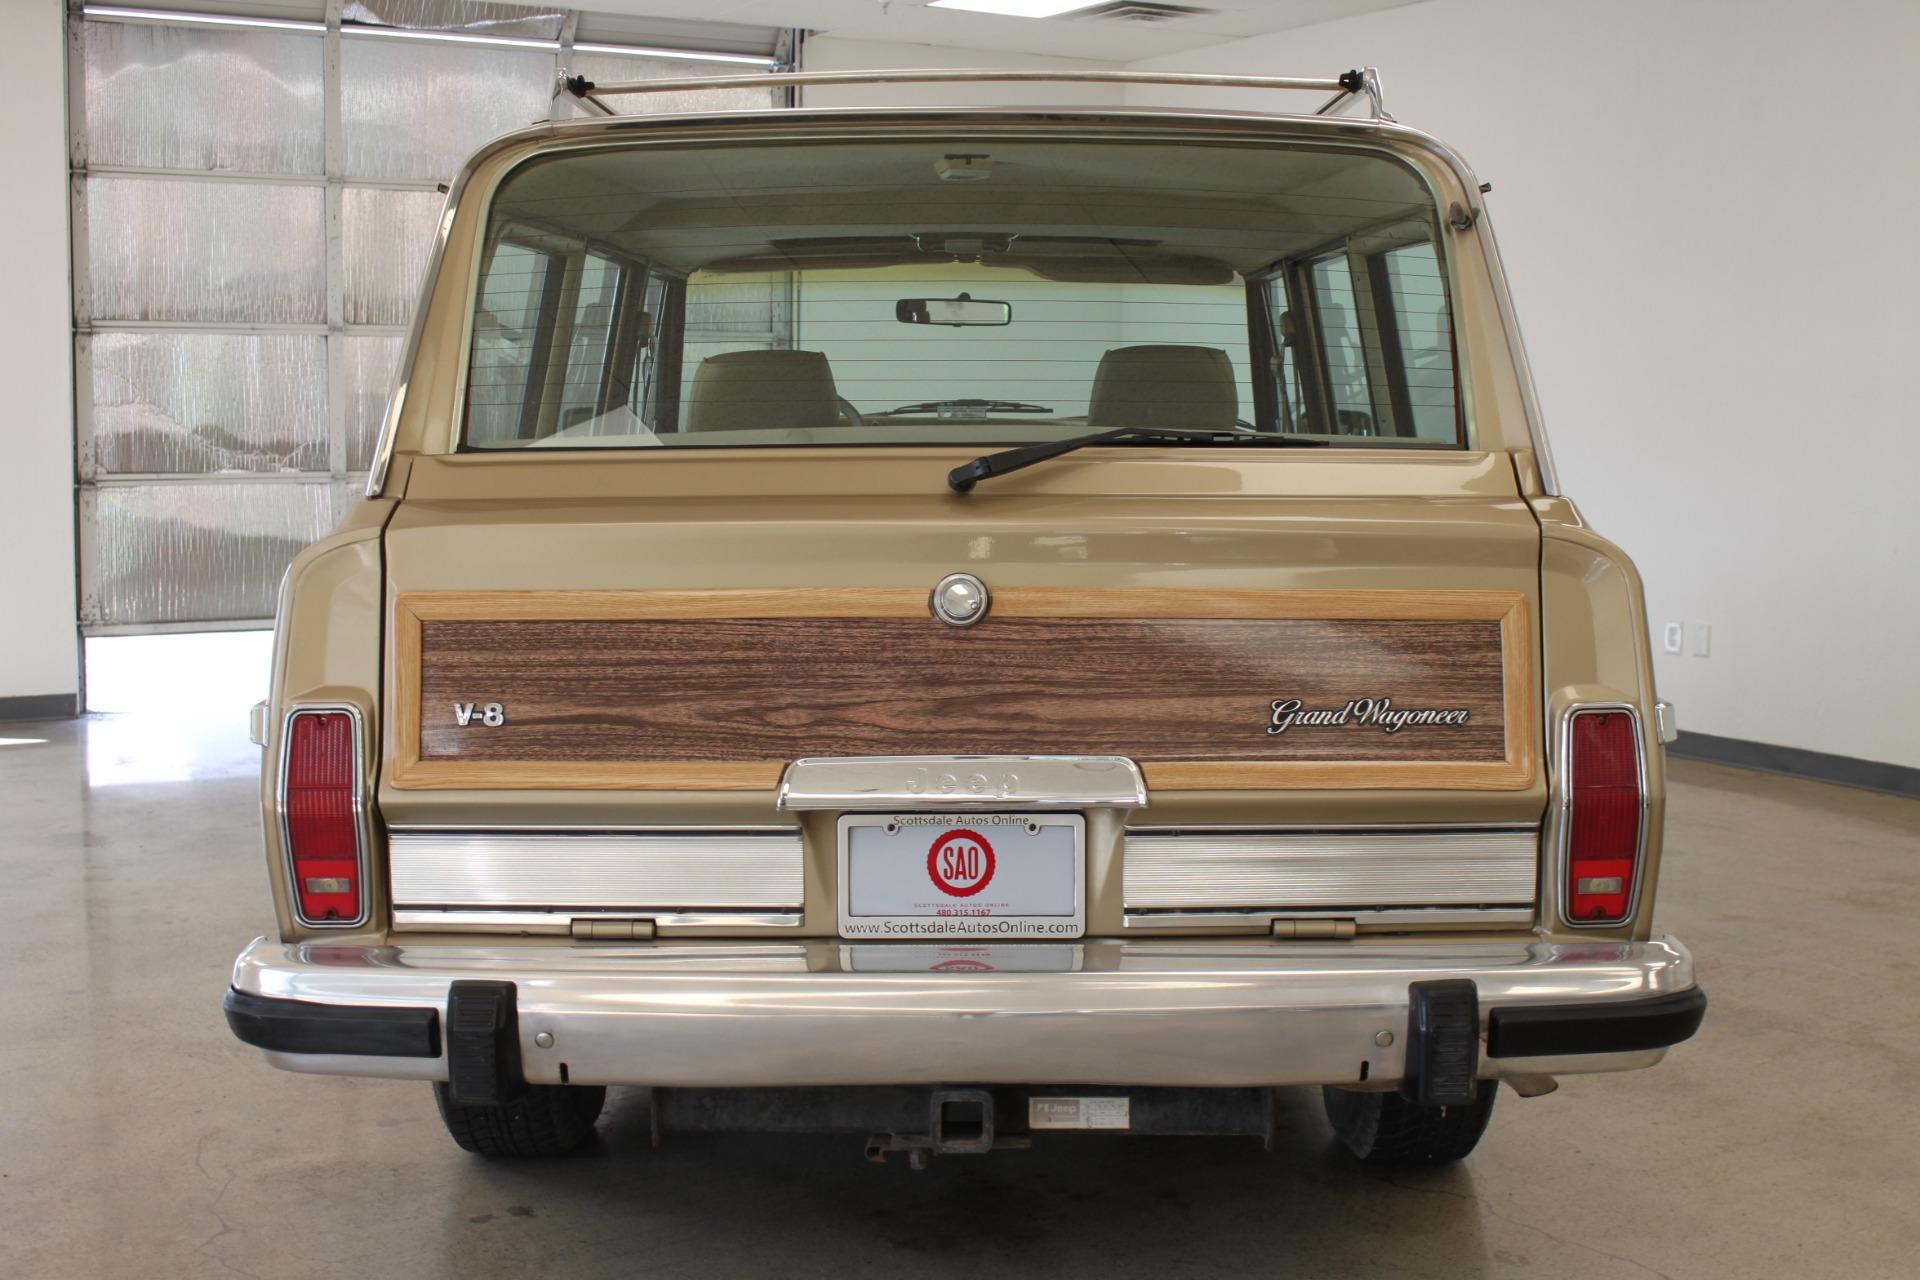 Used-1990-Jeep-Grand-Wagoneer-Mopar